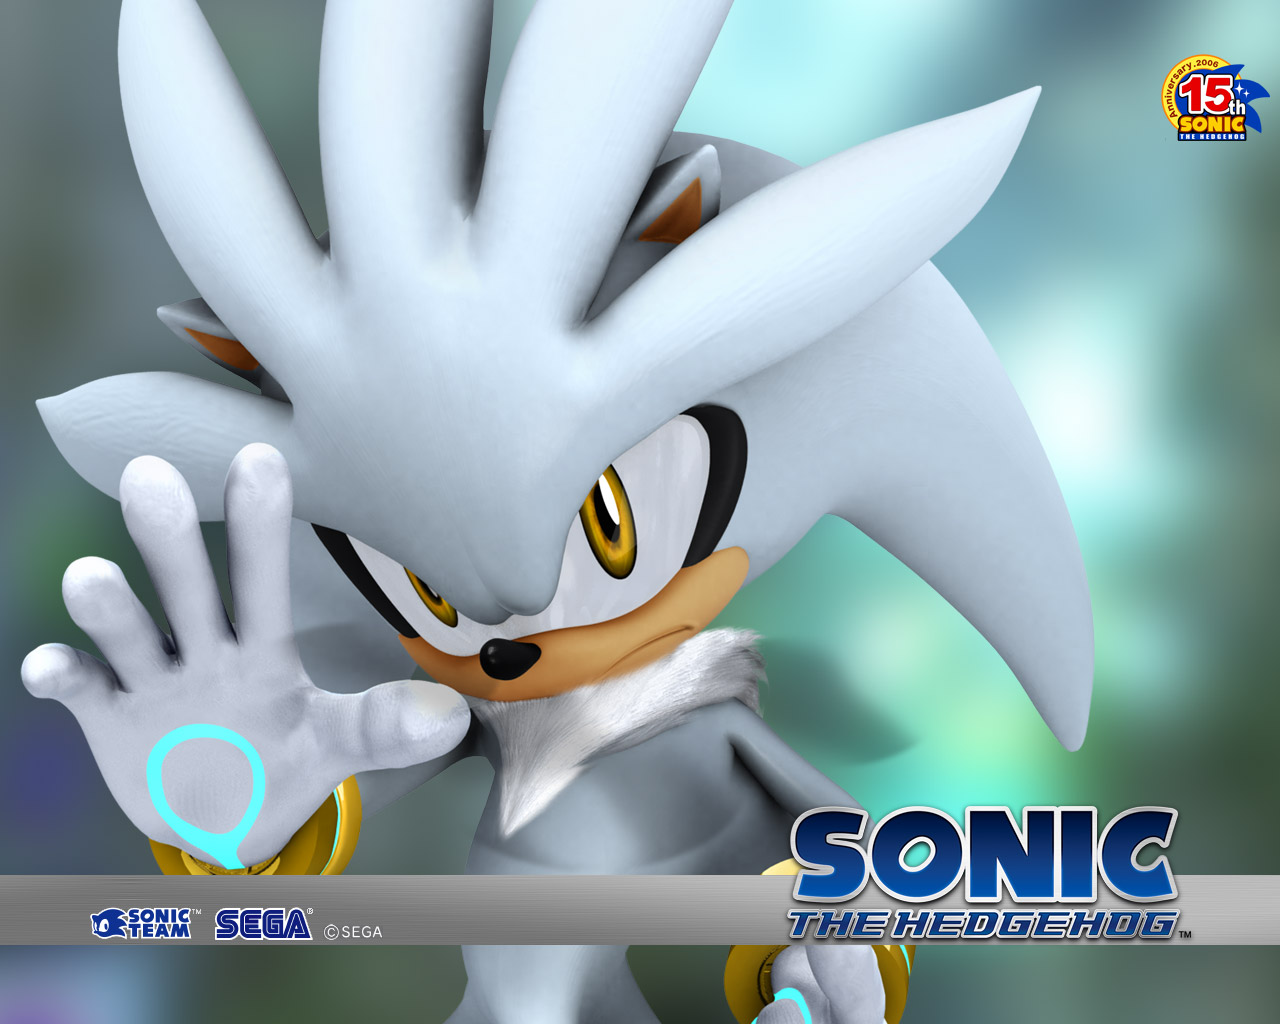 Silver-The-Hedgehog-2006.jpg